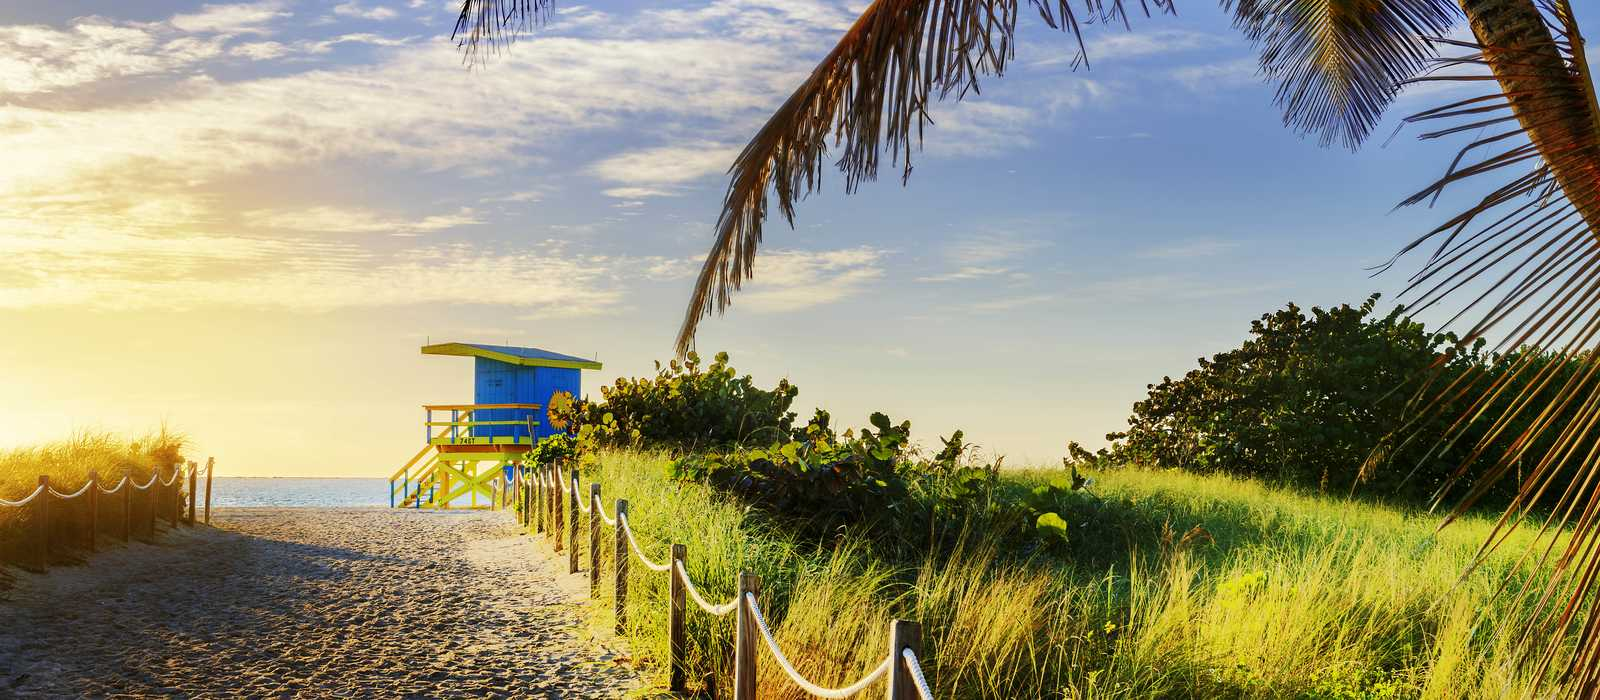 Farbenfroher Rettungsturm am Strand von South Beach, Miami Beach